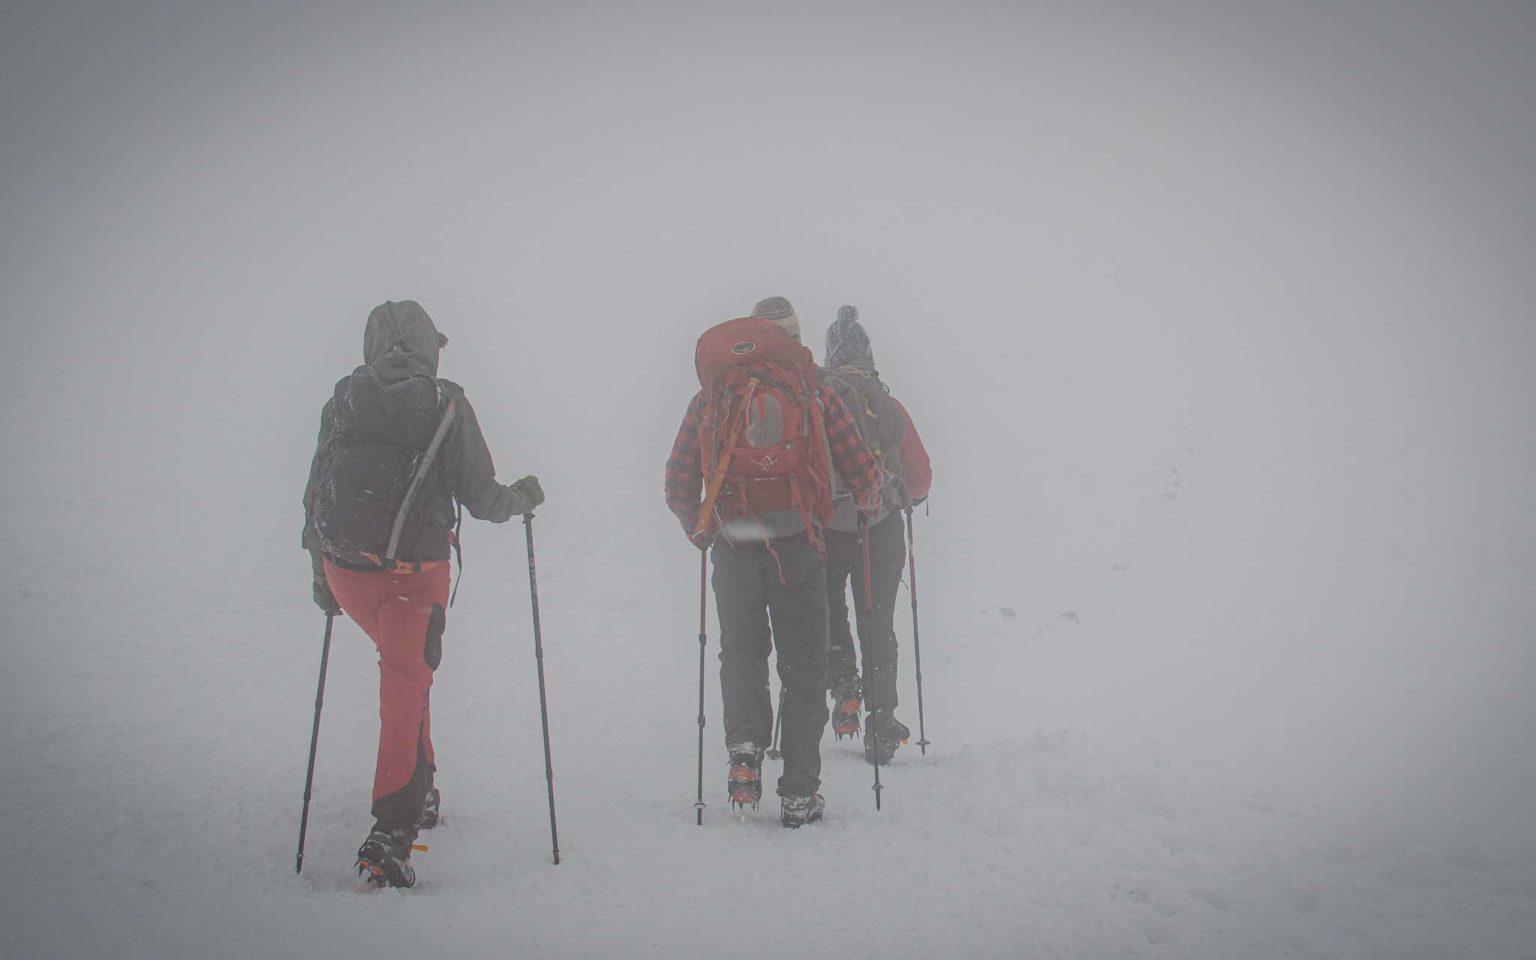 Grupa osób w górach podczas mgły